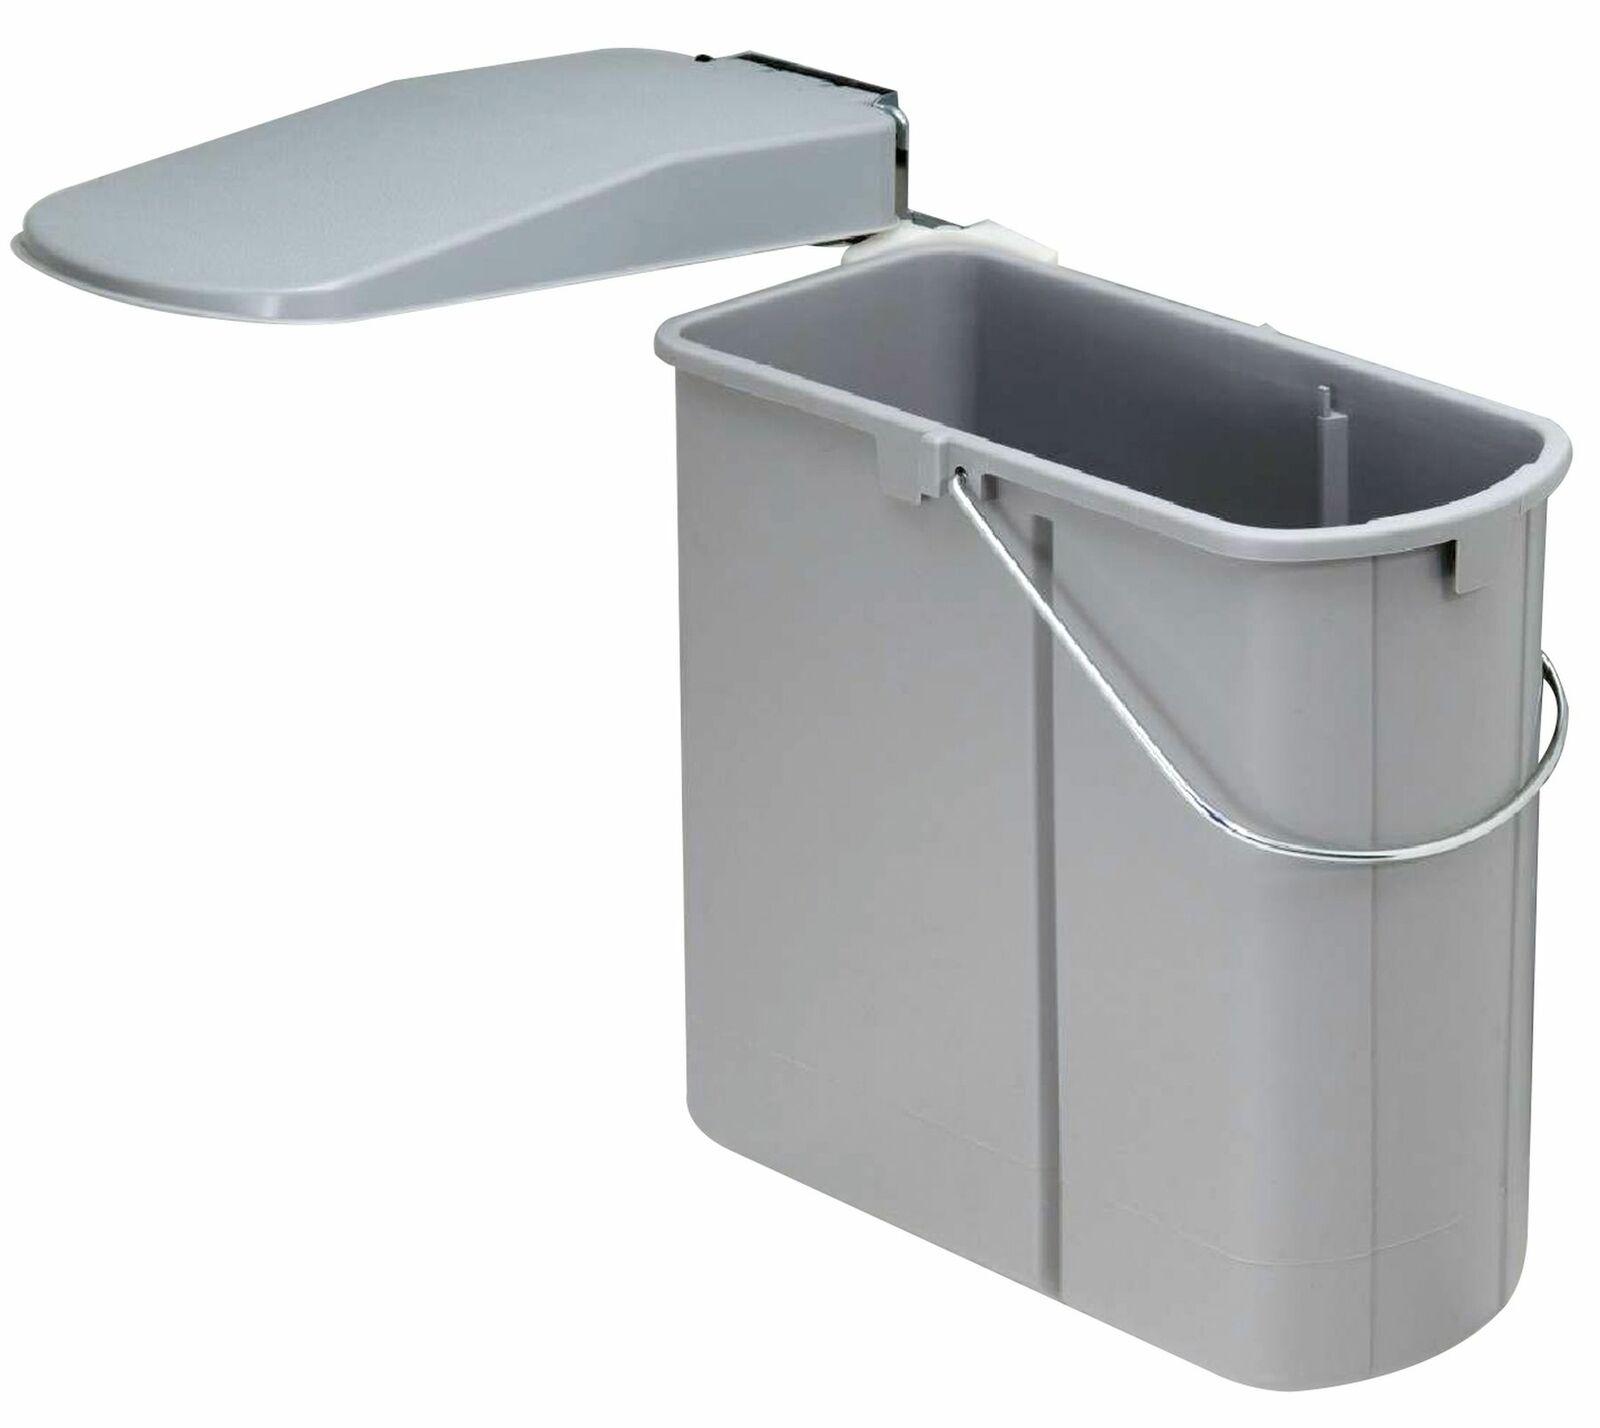 Full Size of Abfalleimer Küche Mülltrennung Doppel Abfalleimer Küche Einbau Abfalleimer Küche Abfalleimer Küche Türmontage Küche Abfalleimer Küche